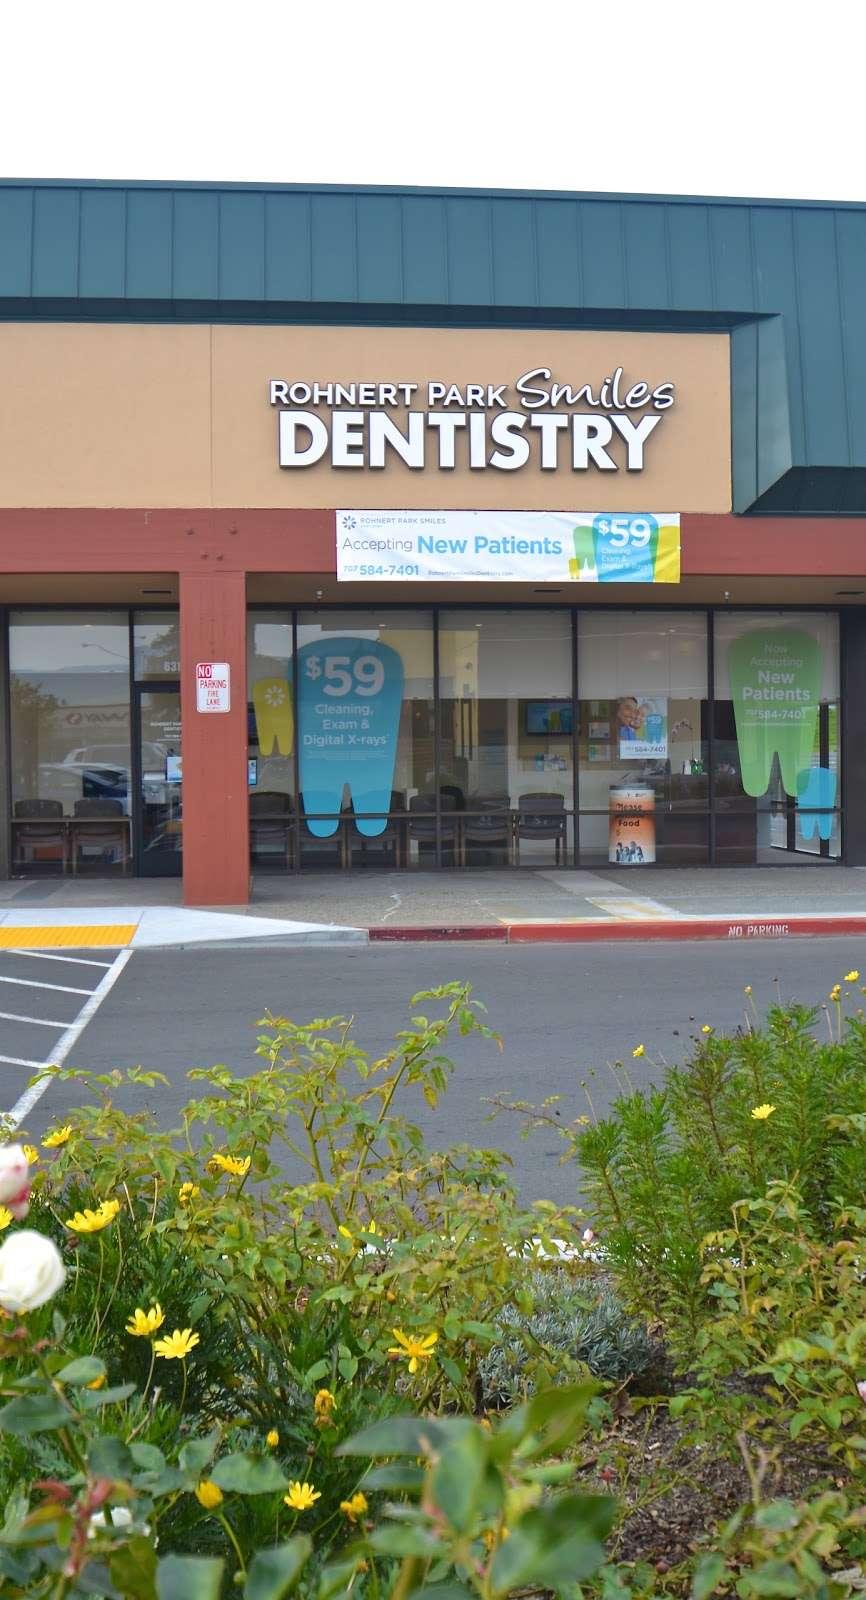 Rohnert Park Smiles Dentistry - dentist    Photo 4 of 10   Address: 6315 Commerce Blvd, Rohnert Park, CA 94928, USA   Phone: (707) 584-7401